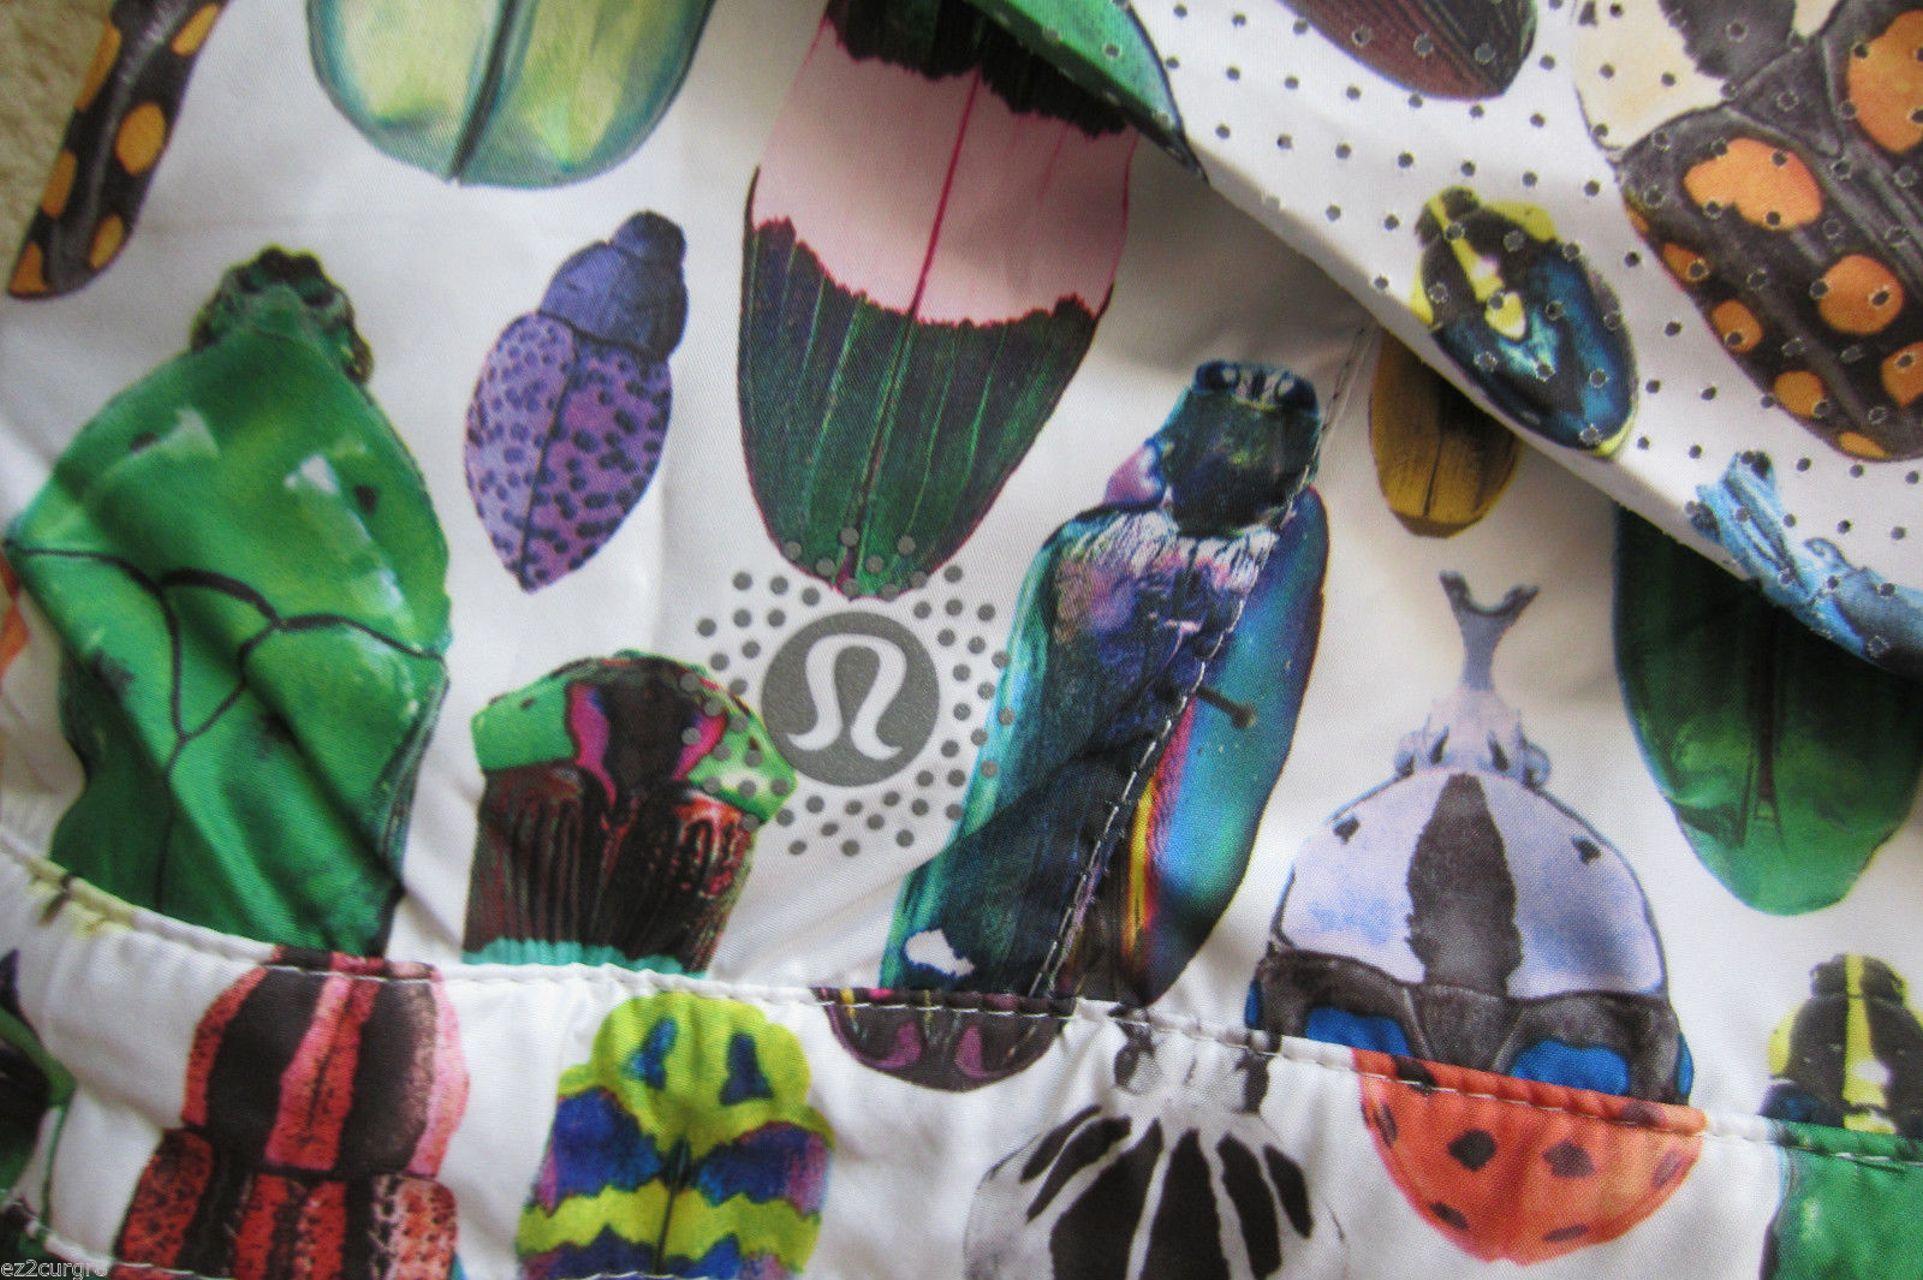 Lululemon Miss Misty Jacket - 2015 Seawheeze - Bugs